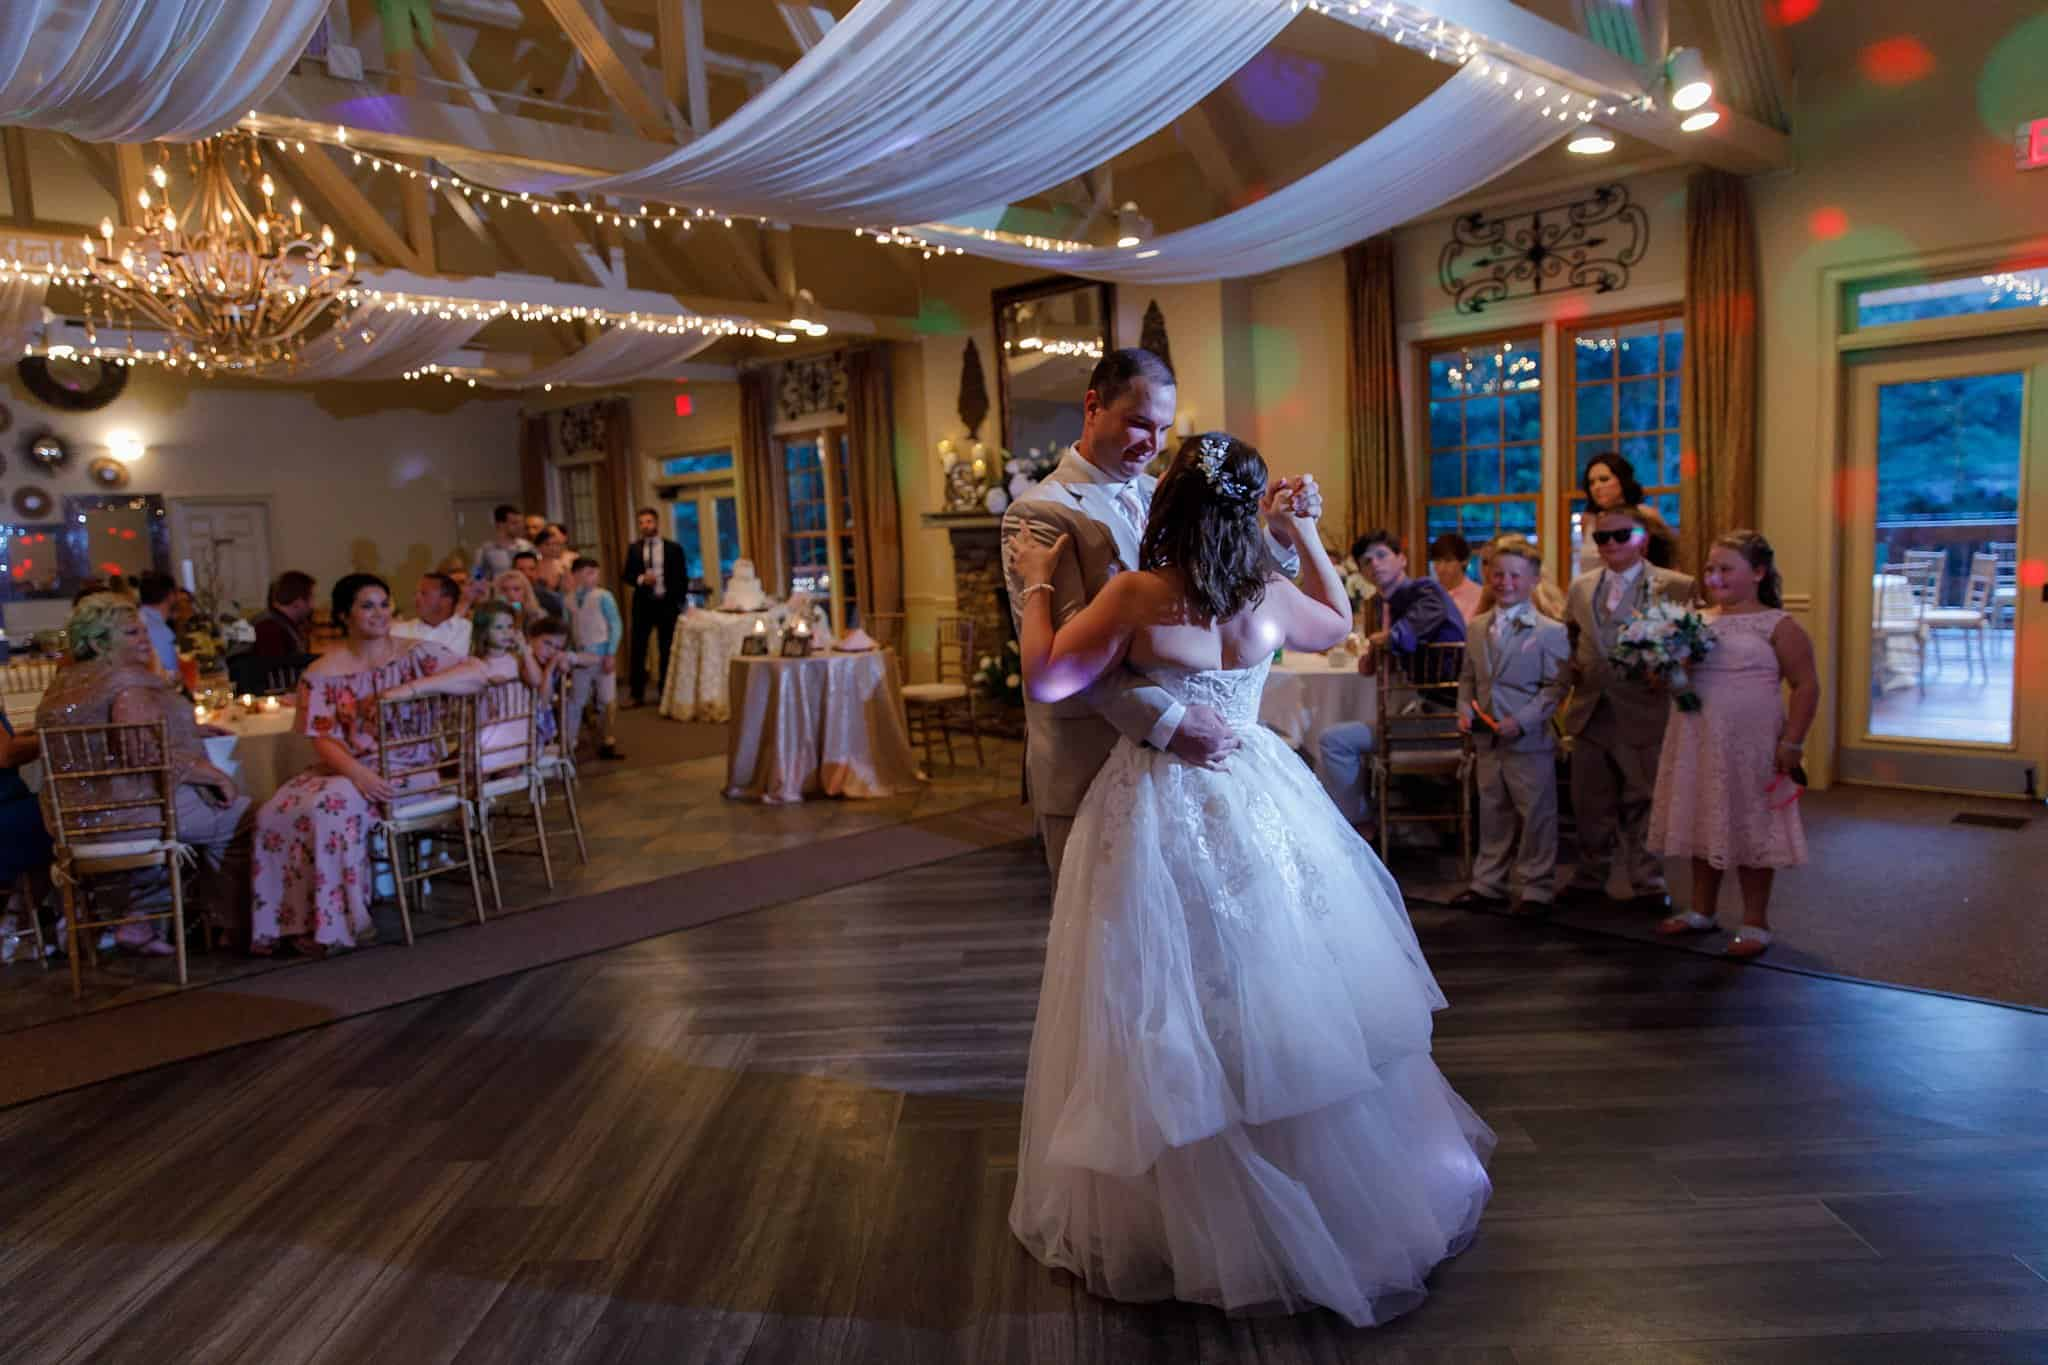 Bride and Groom 1st Dance on Dancefloor at Wedding Reception